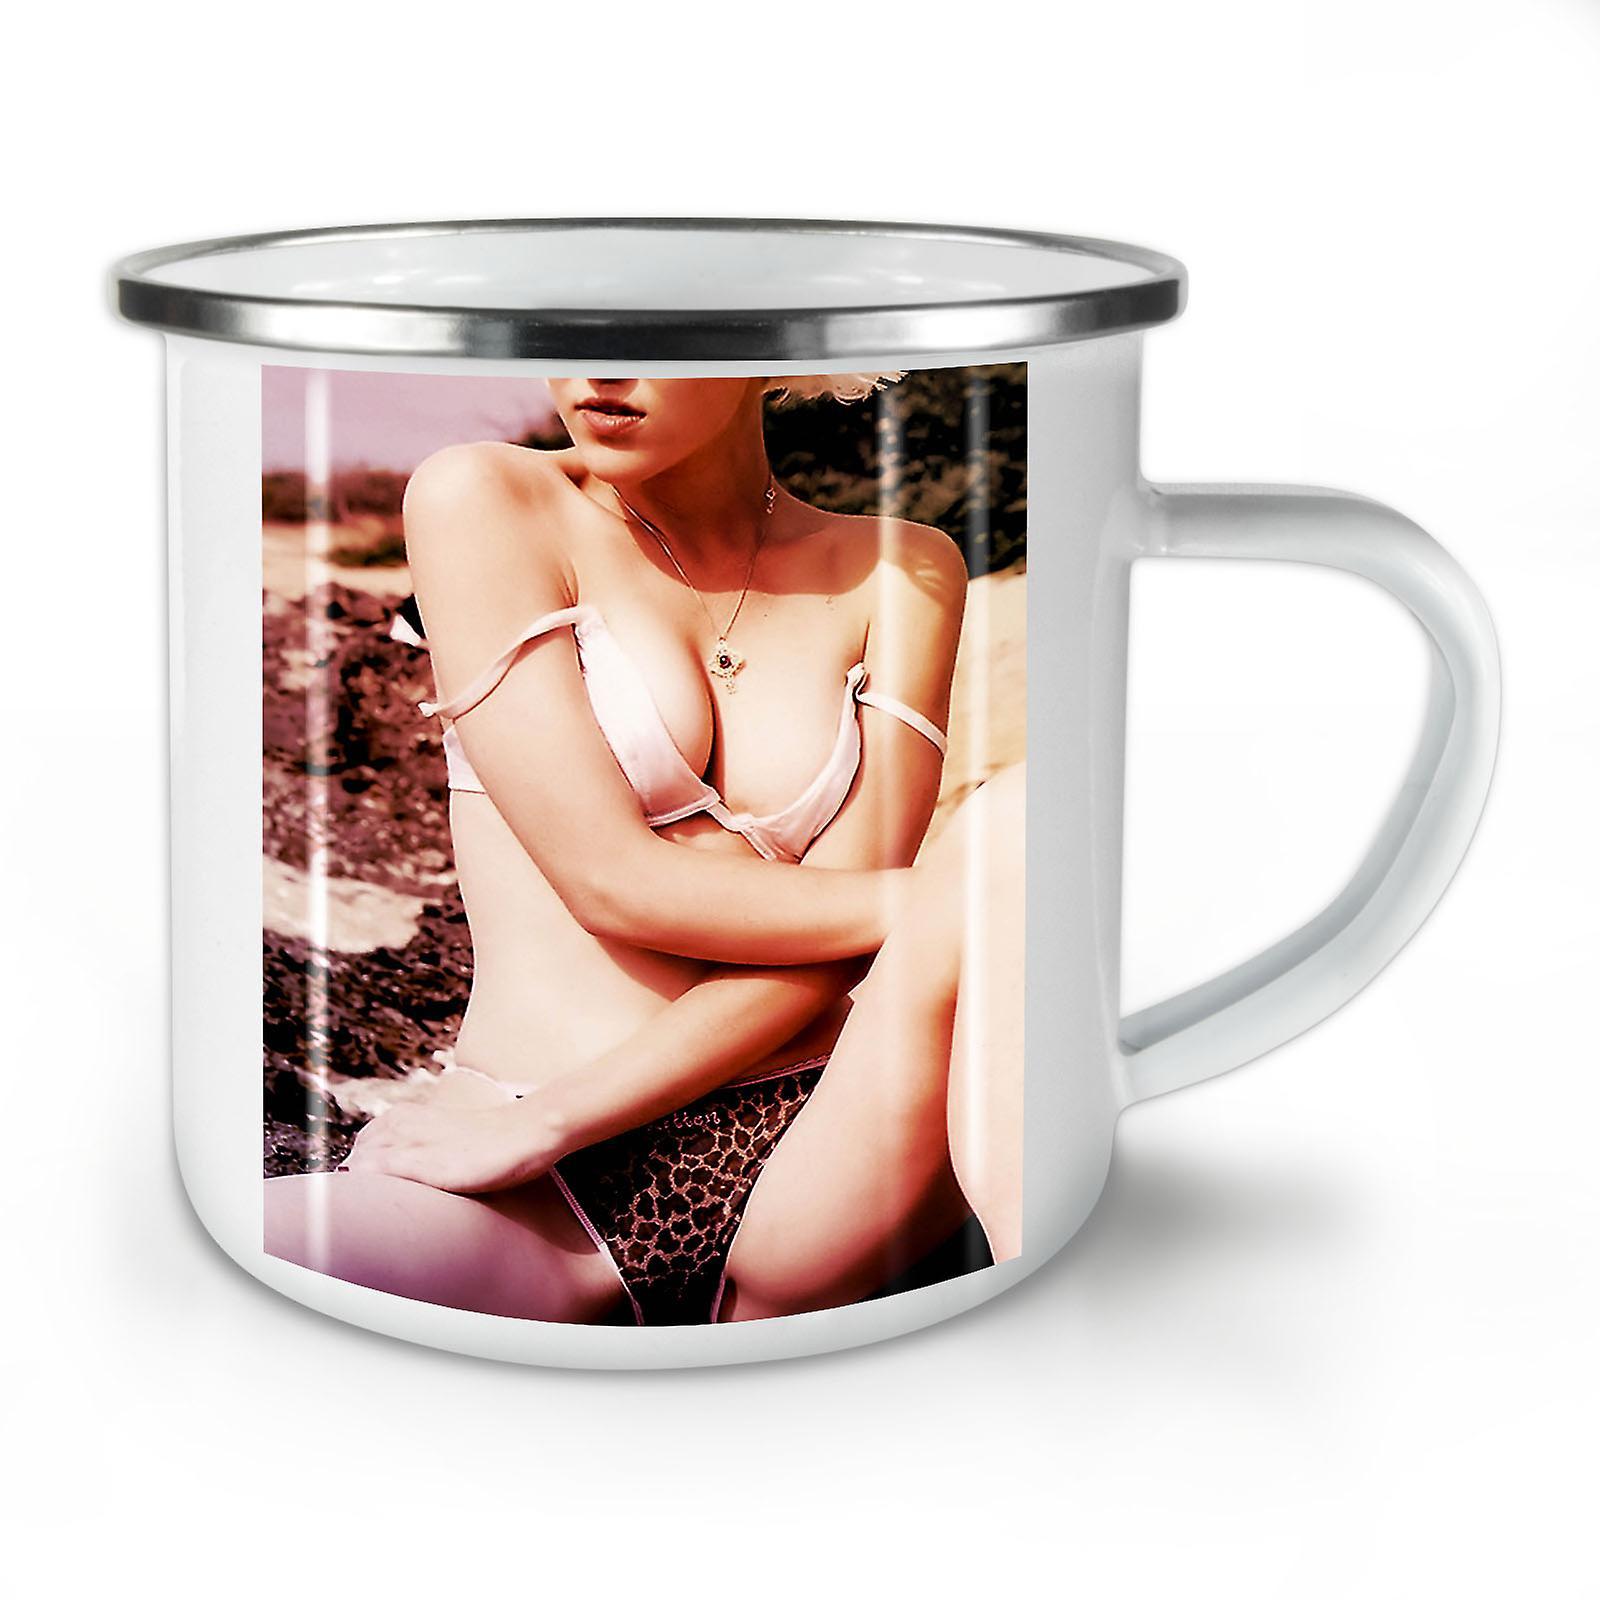 Mug10 Nouveau Fille OzWellcoda Whitetea Érotique Nue Sexy Émail Café 5jq4R3AL